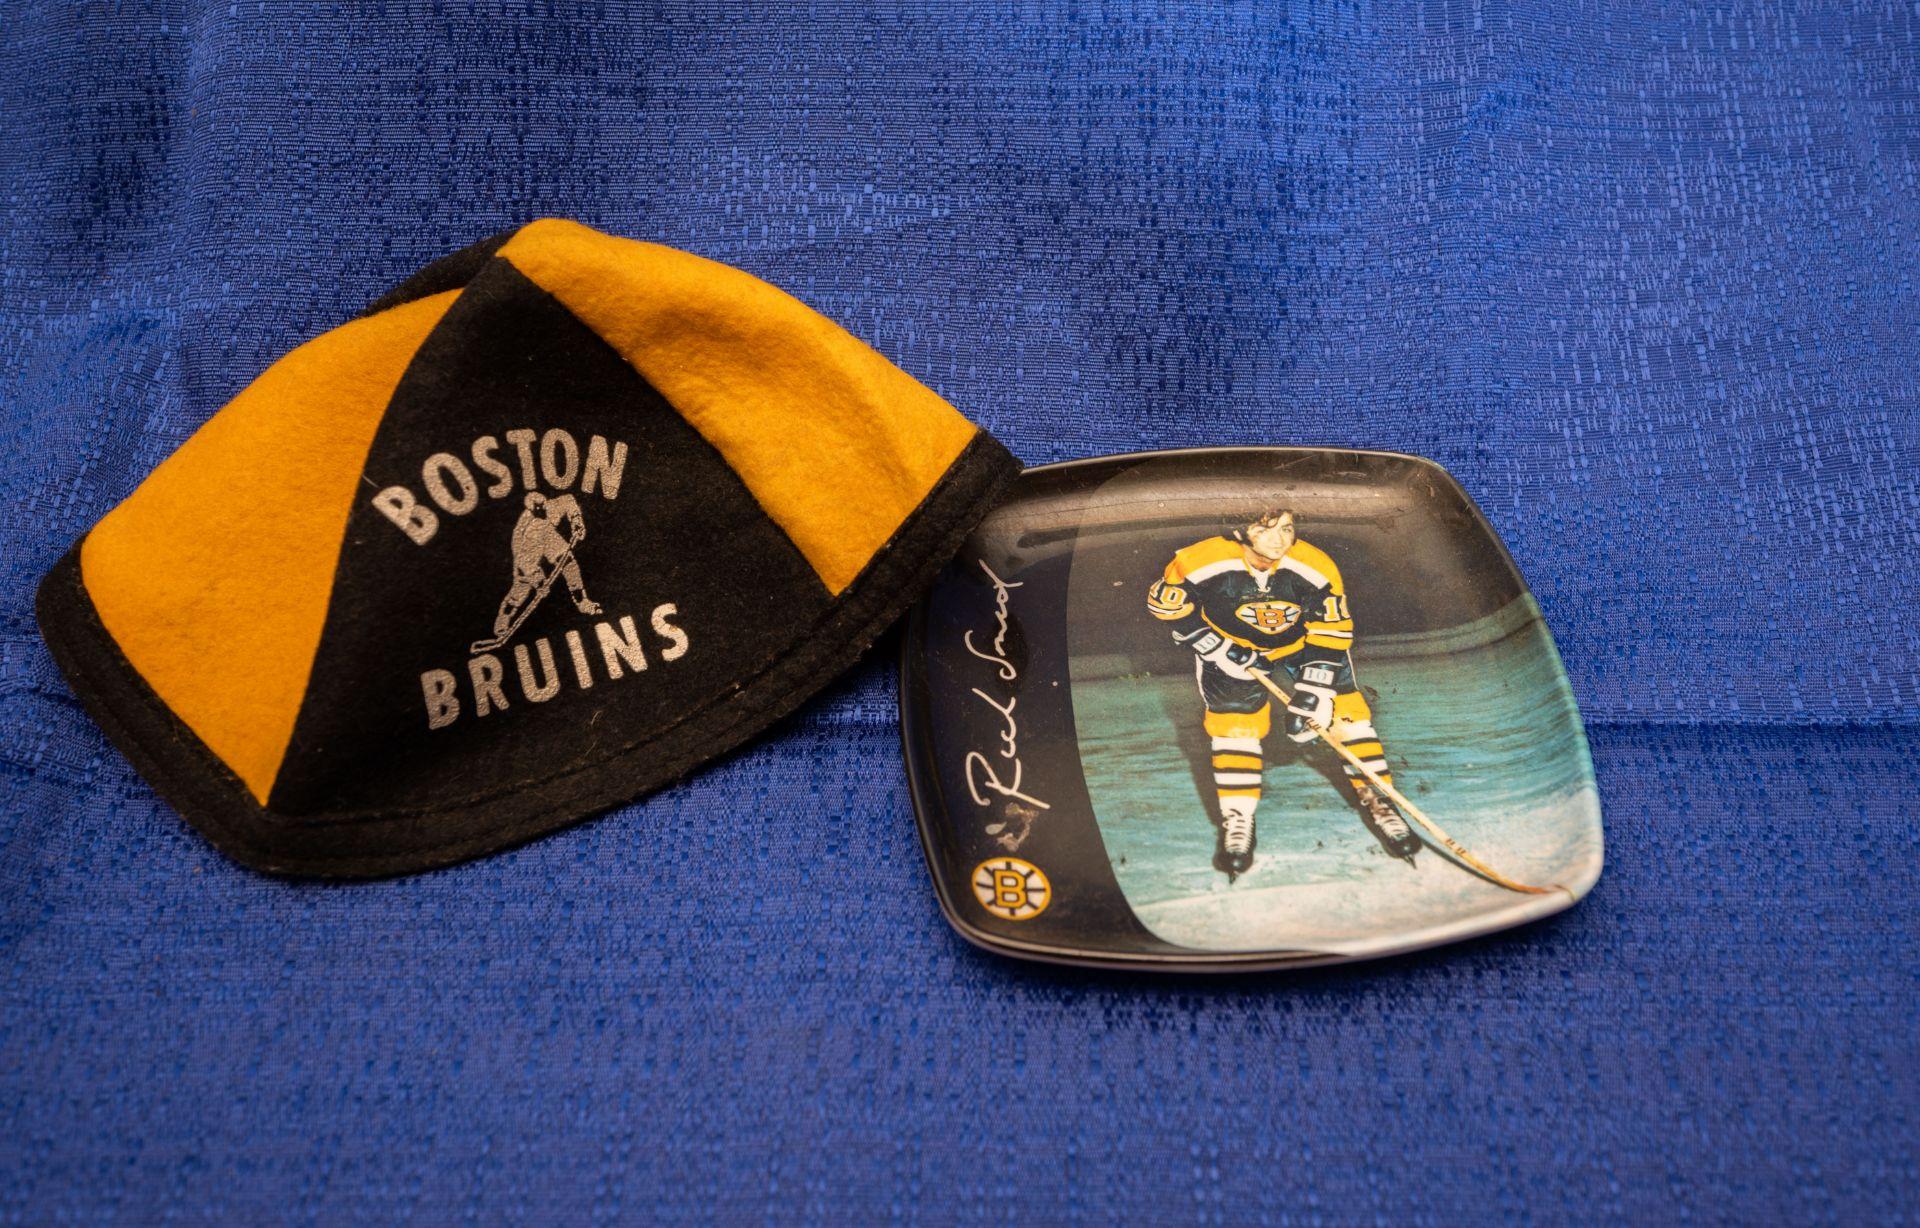 (2) Pieces of Boston Bruins Décor